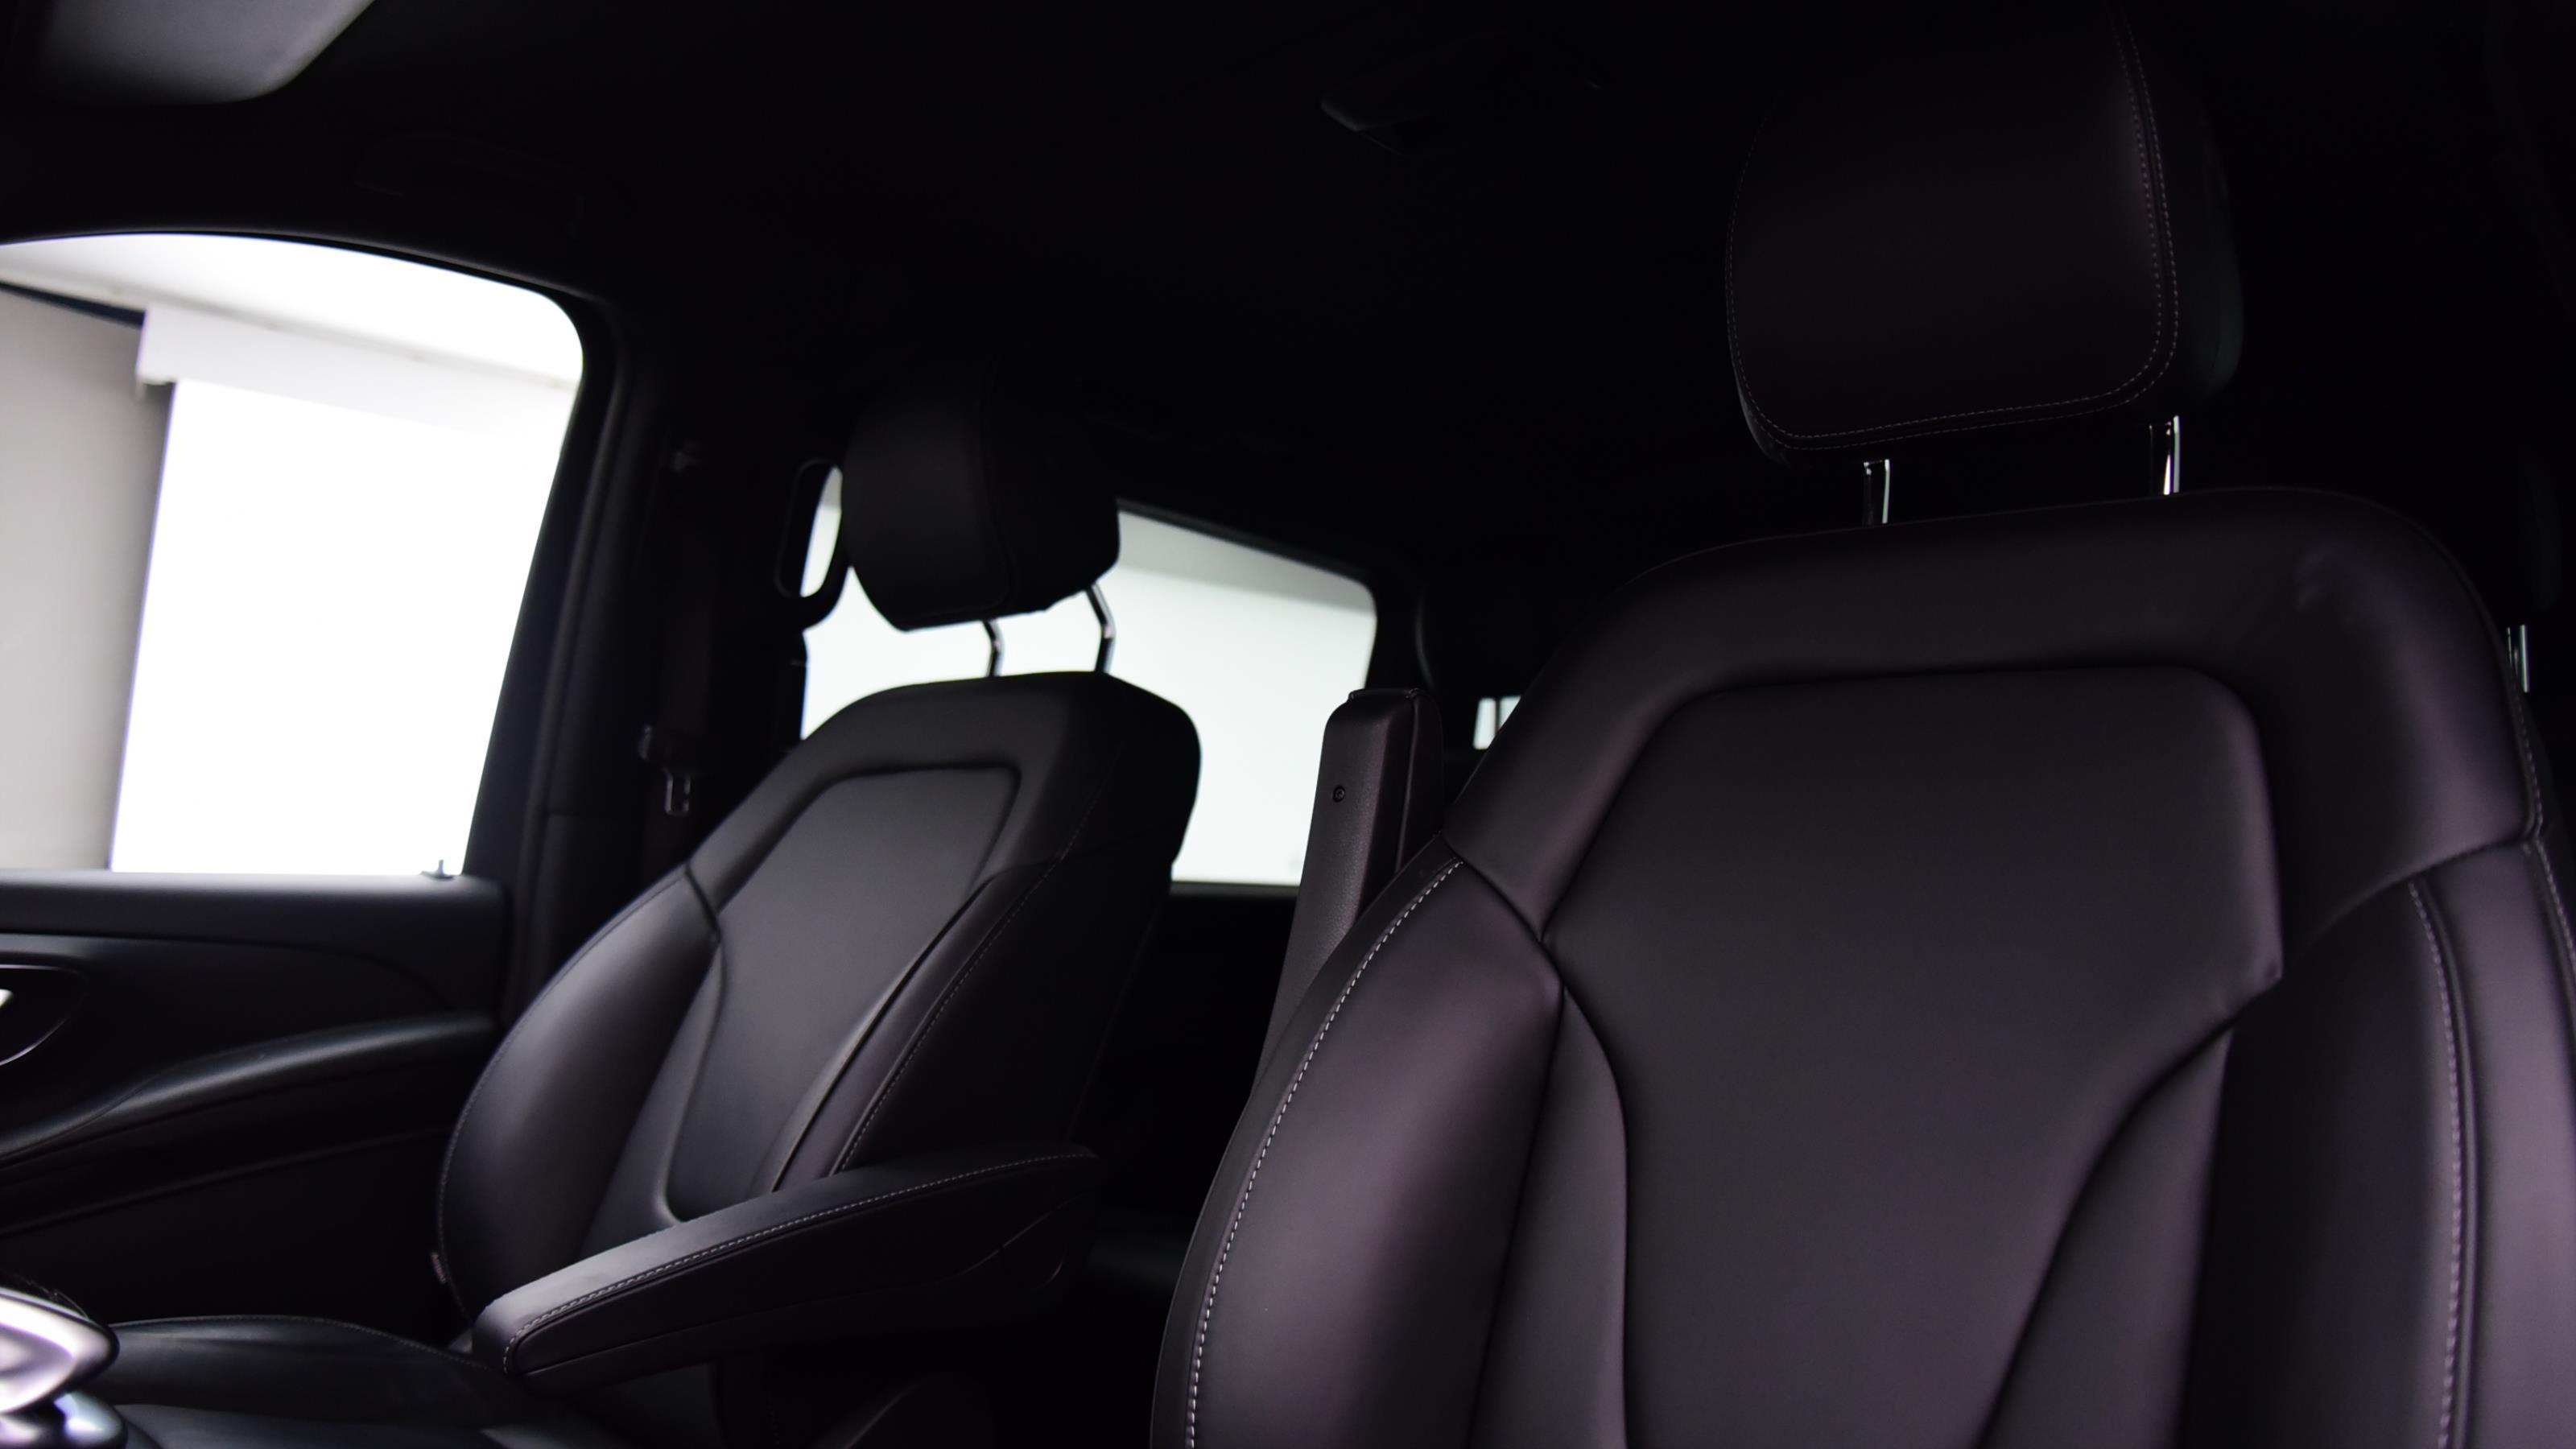 Used 2017 Mercedes-Benz V CLASS V220 BlueTEC Sport 5dr Auto [Extra Long] Grey at Saxton4x4